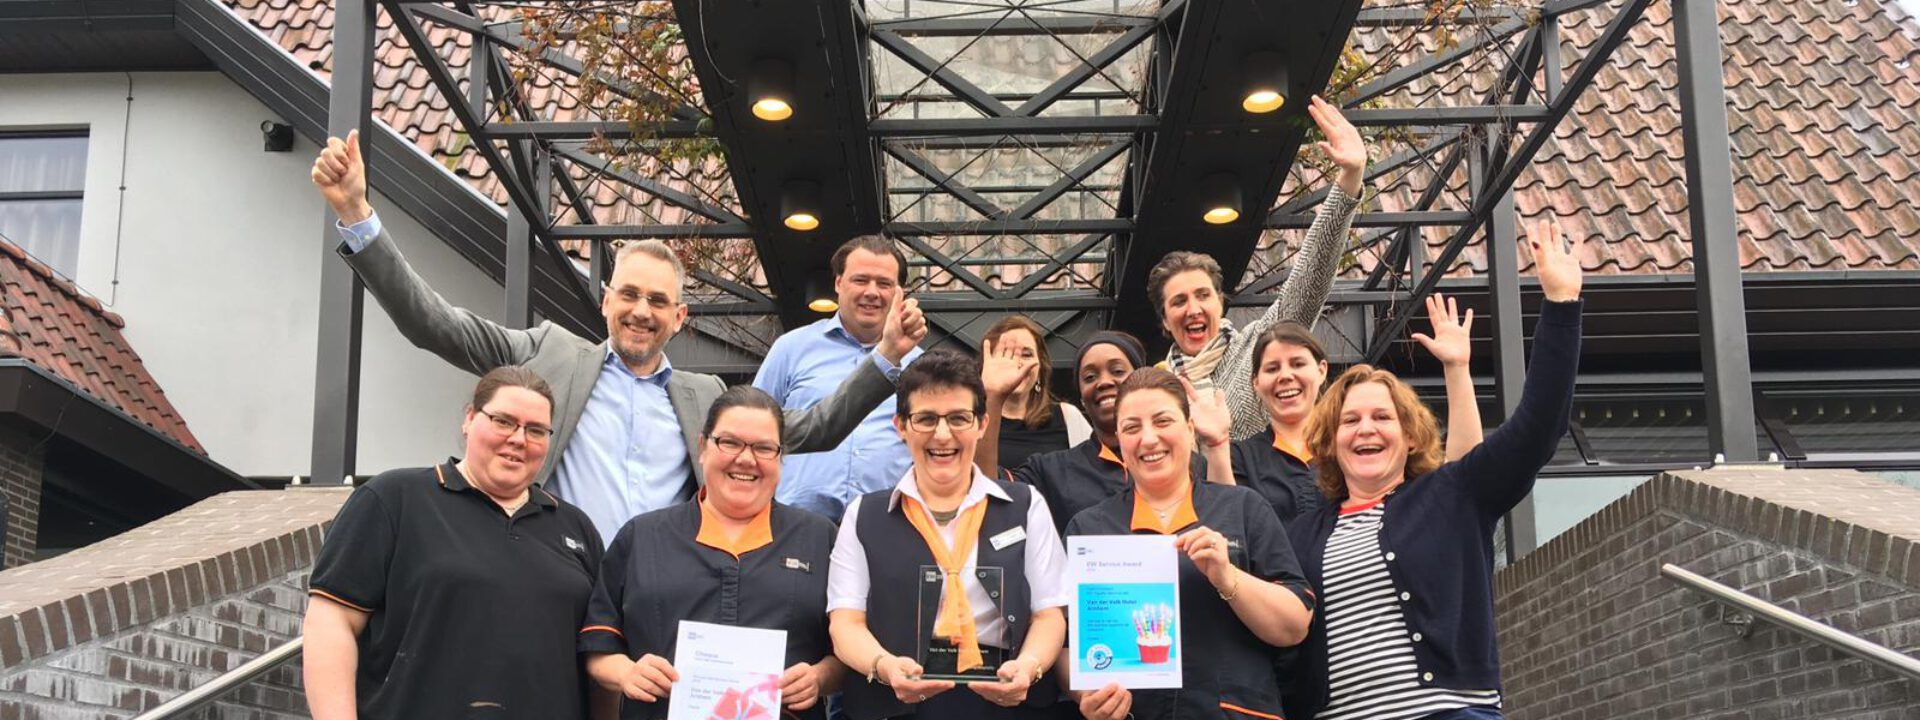 Team Van der Valk Arnhem wint de EW Service Award